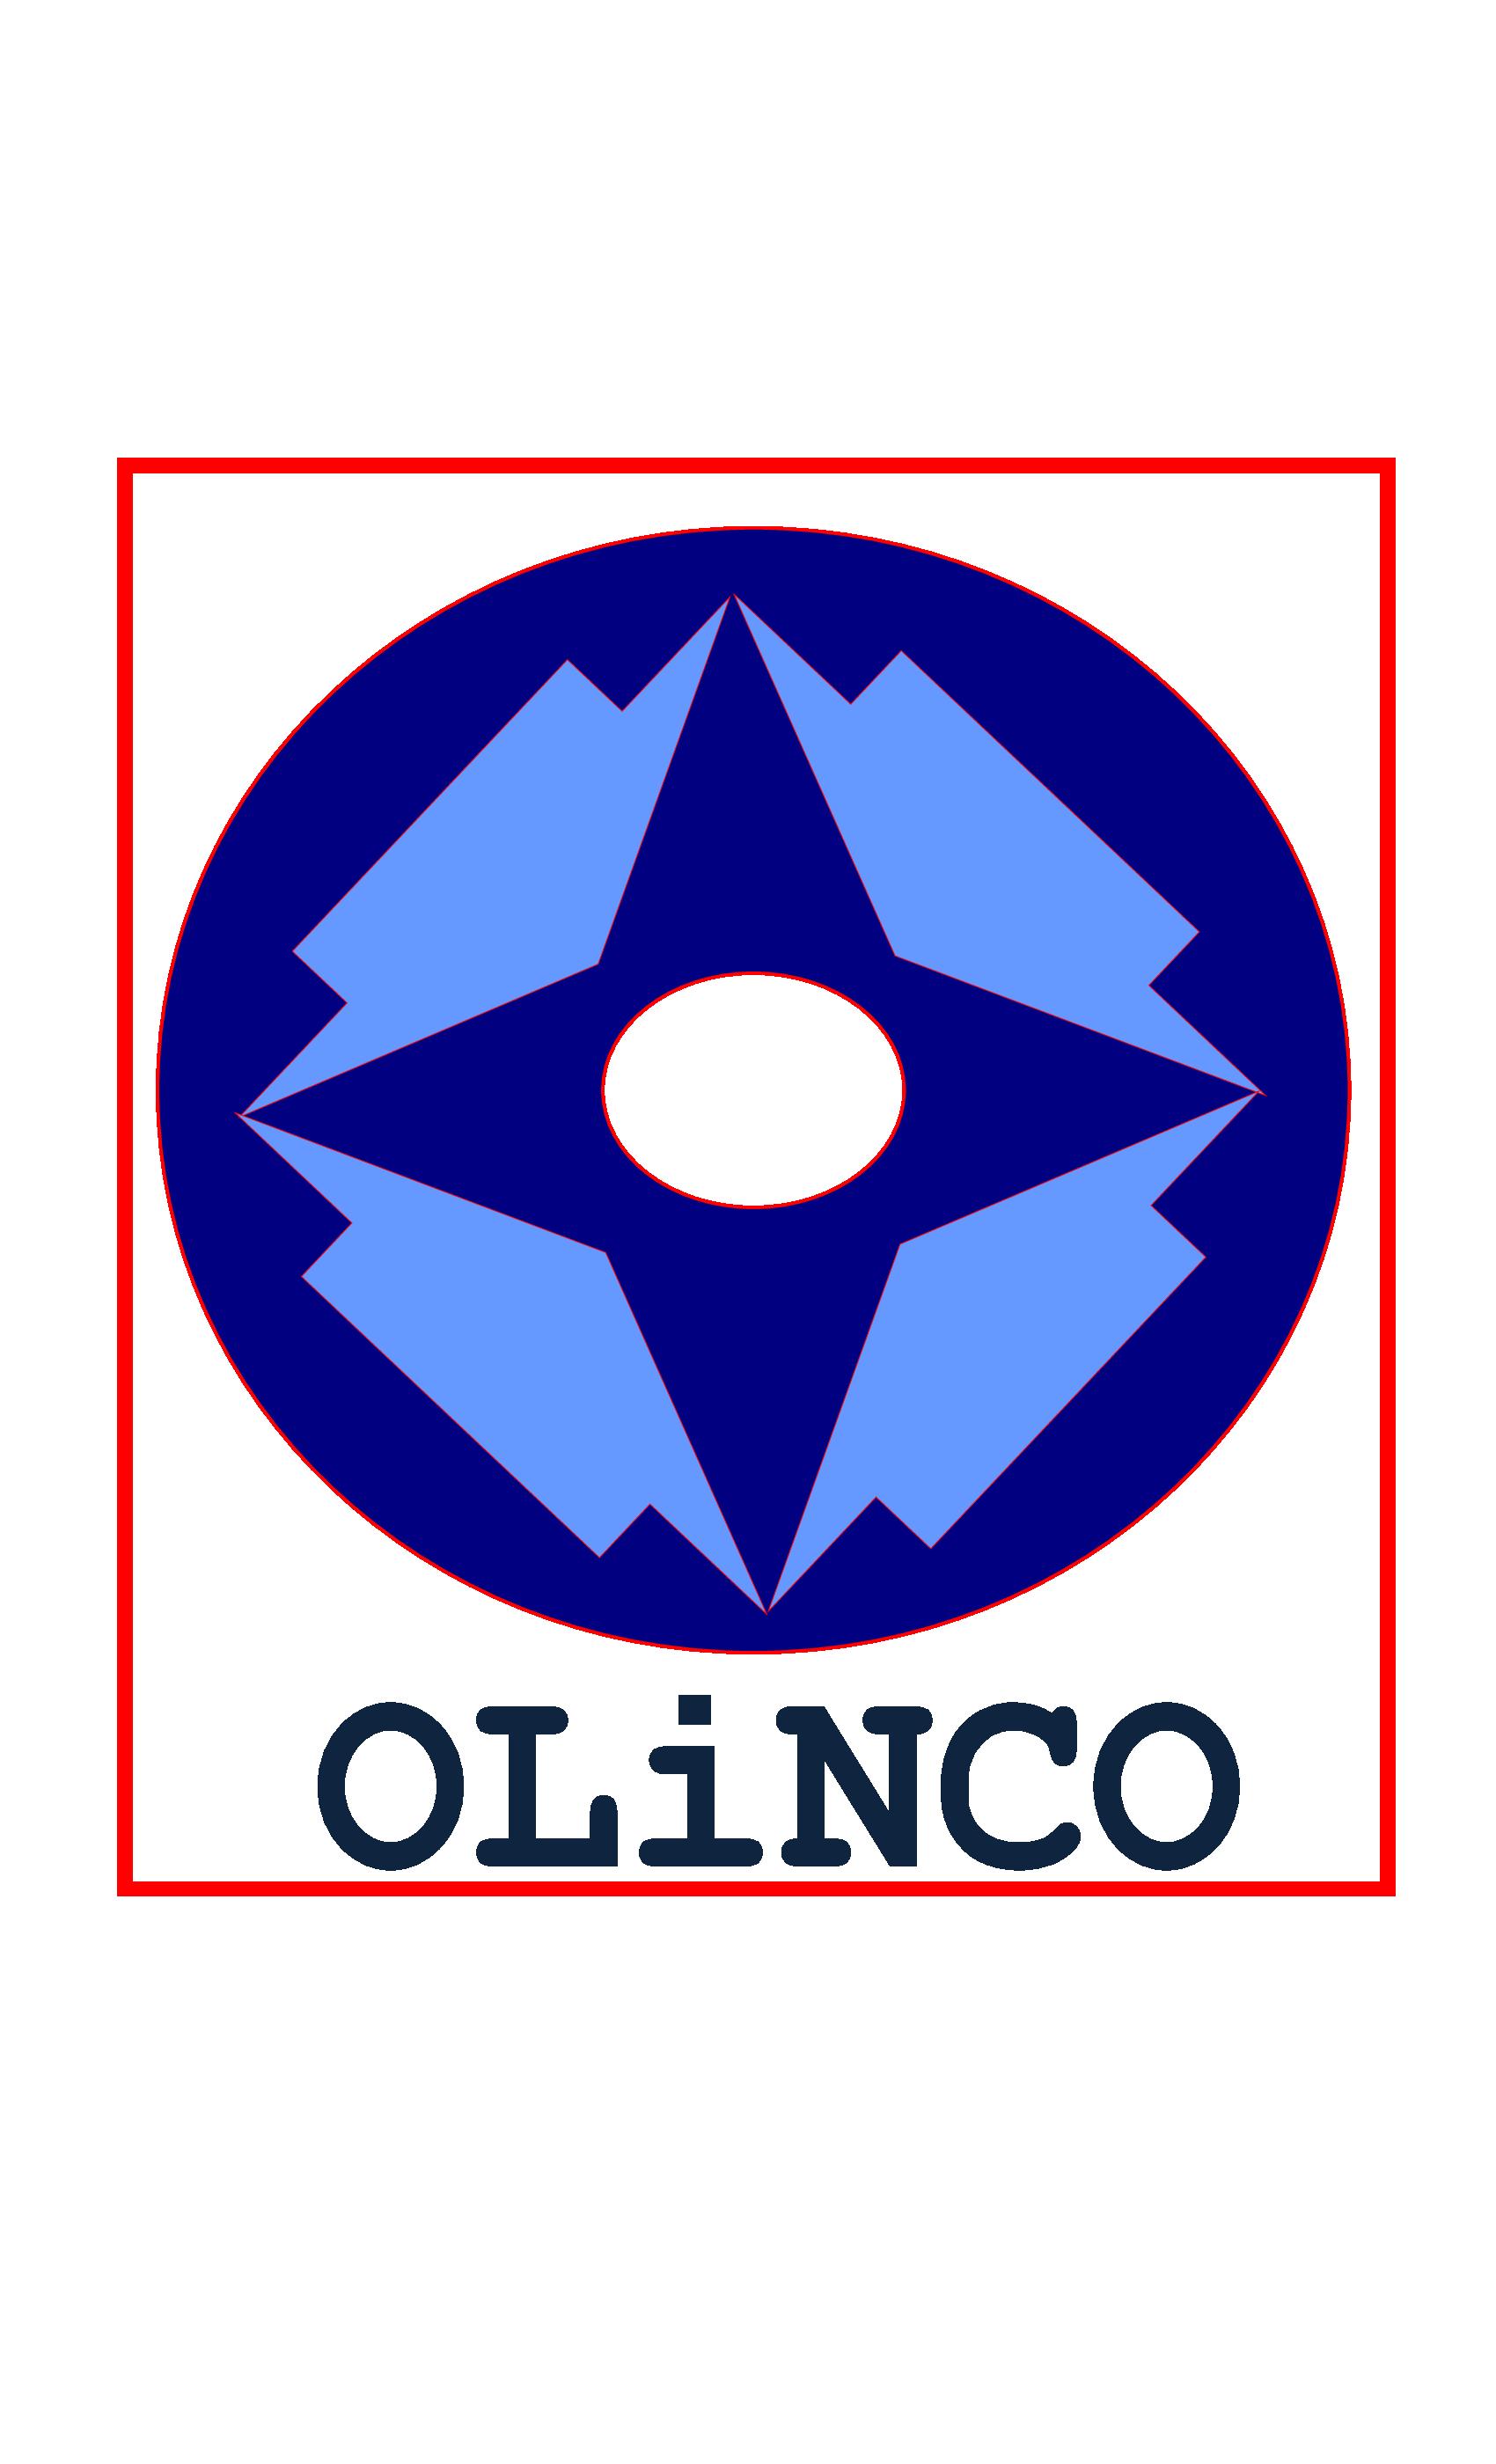 olin-development-engineering-&-constructionphotos-1